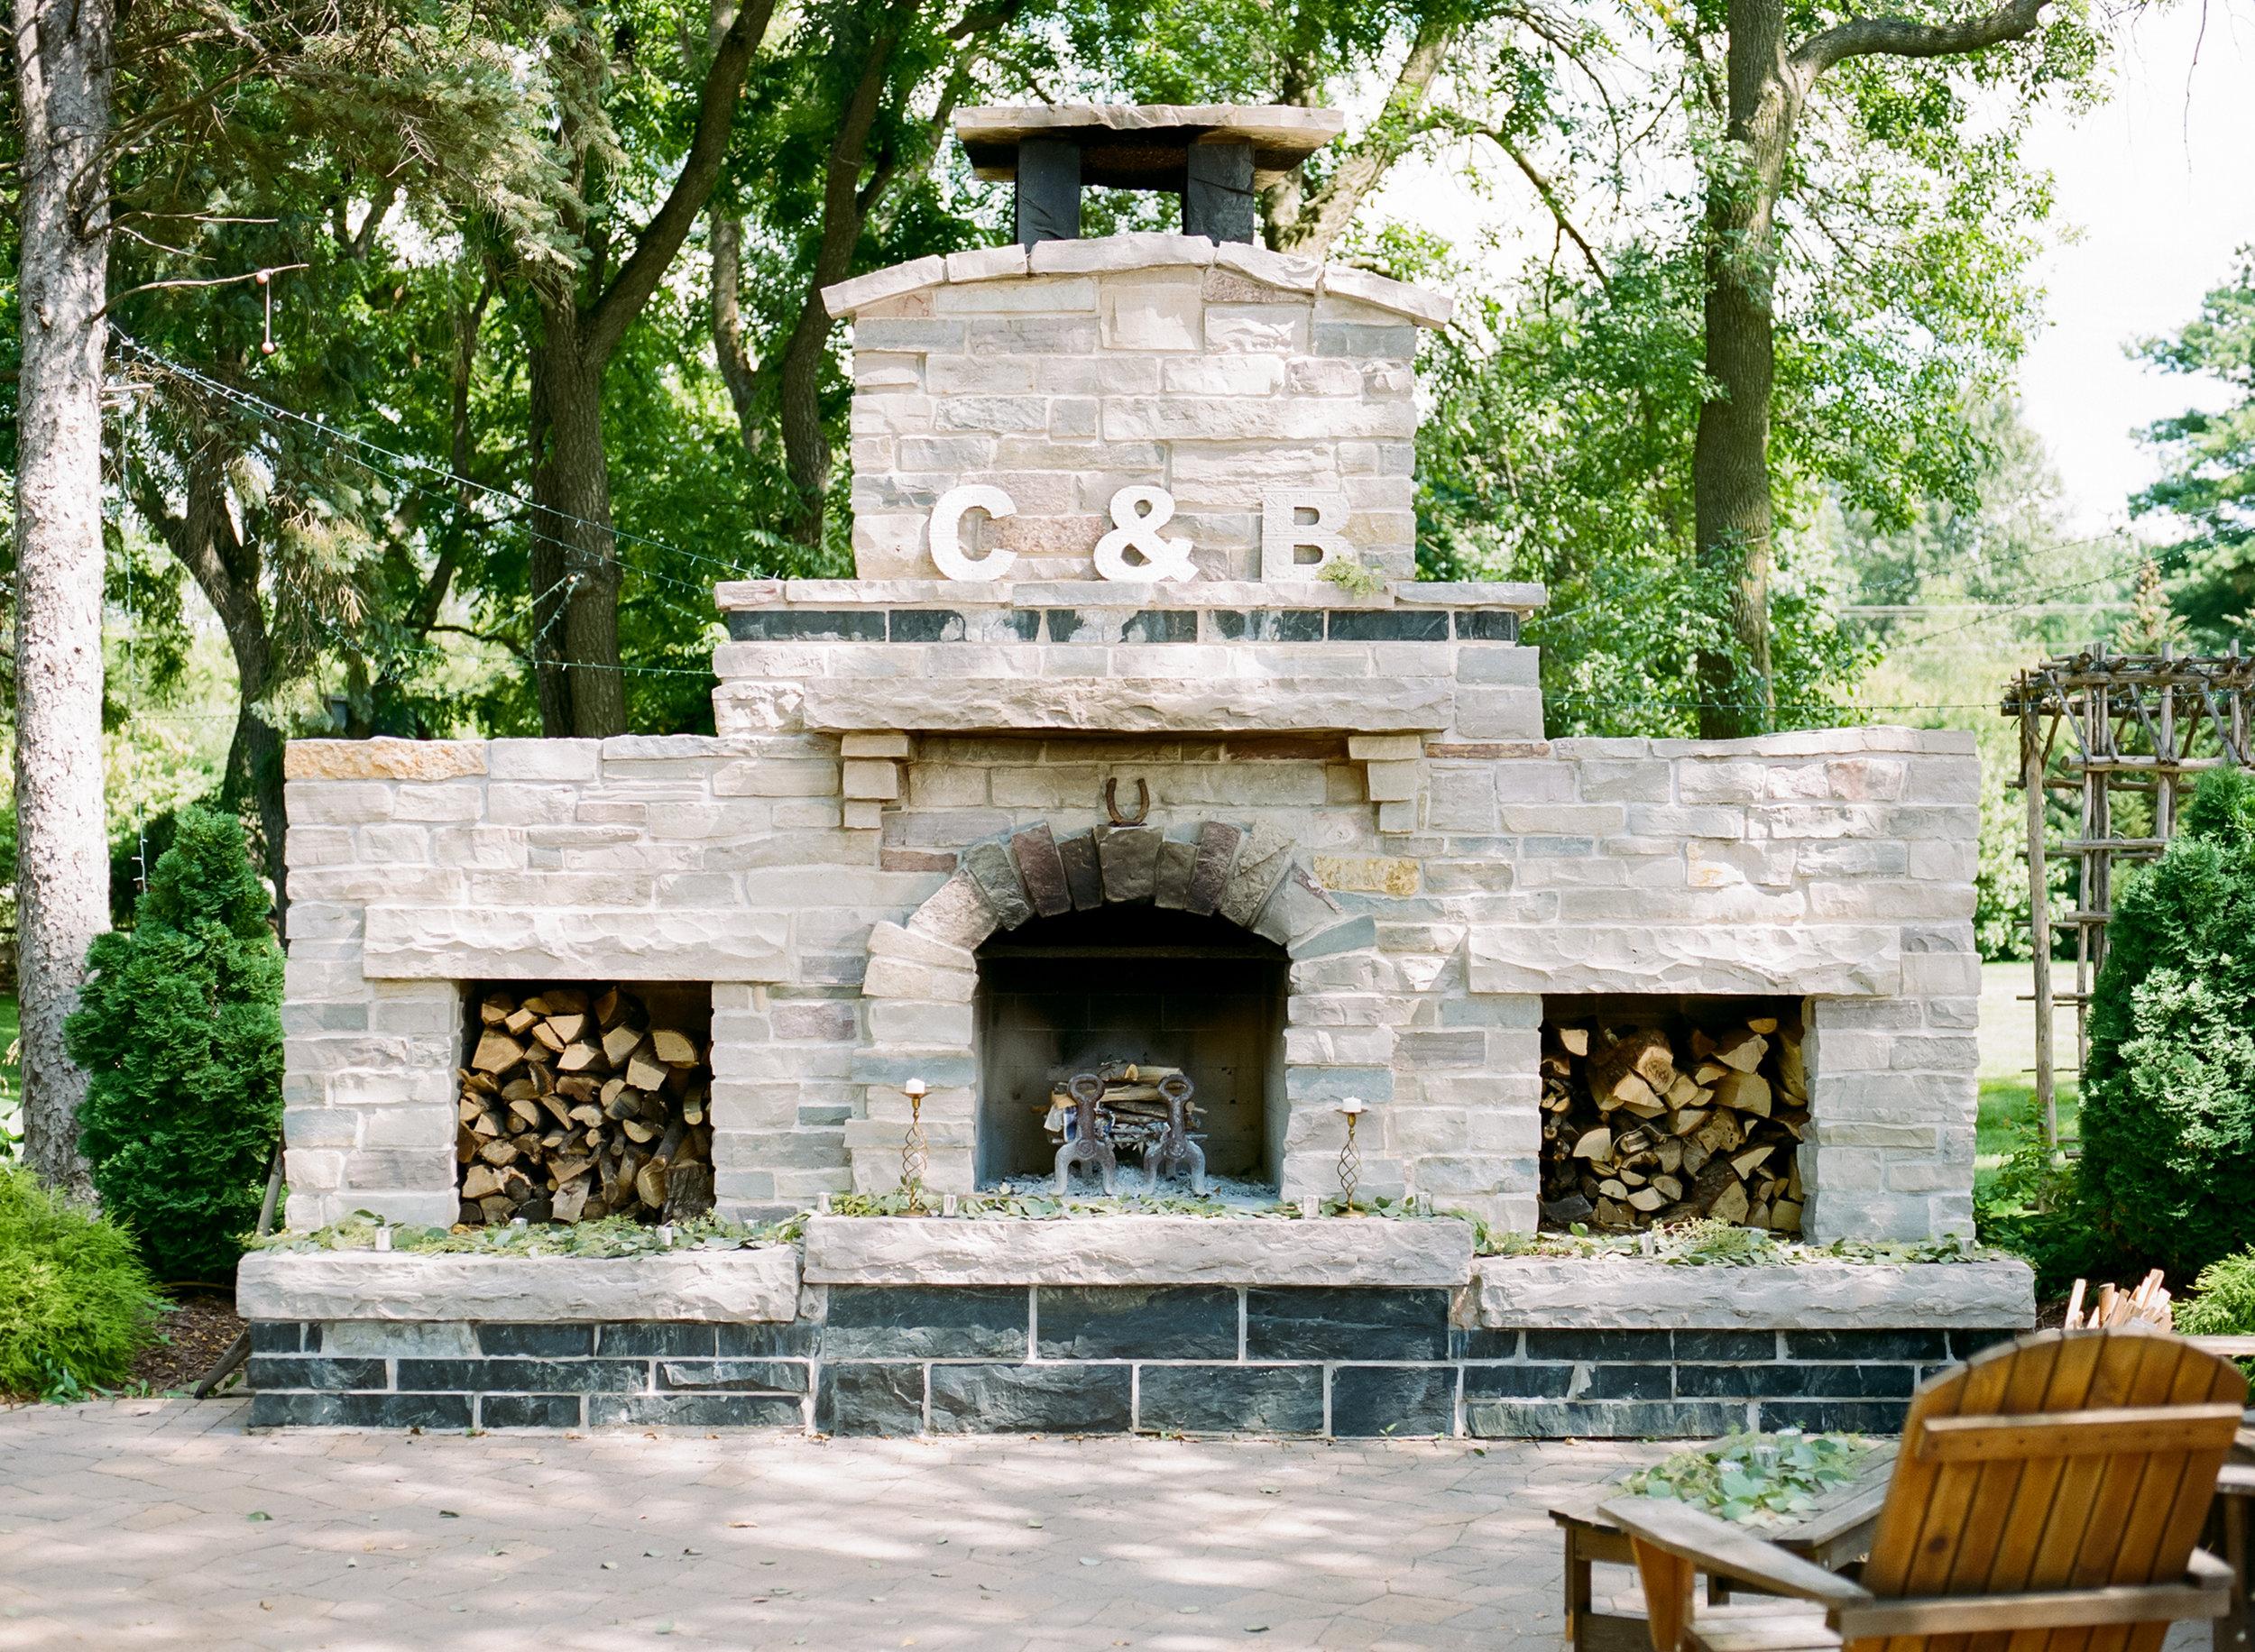 Venue:  The Gardens of Castle Rock